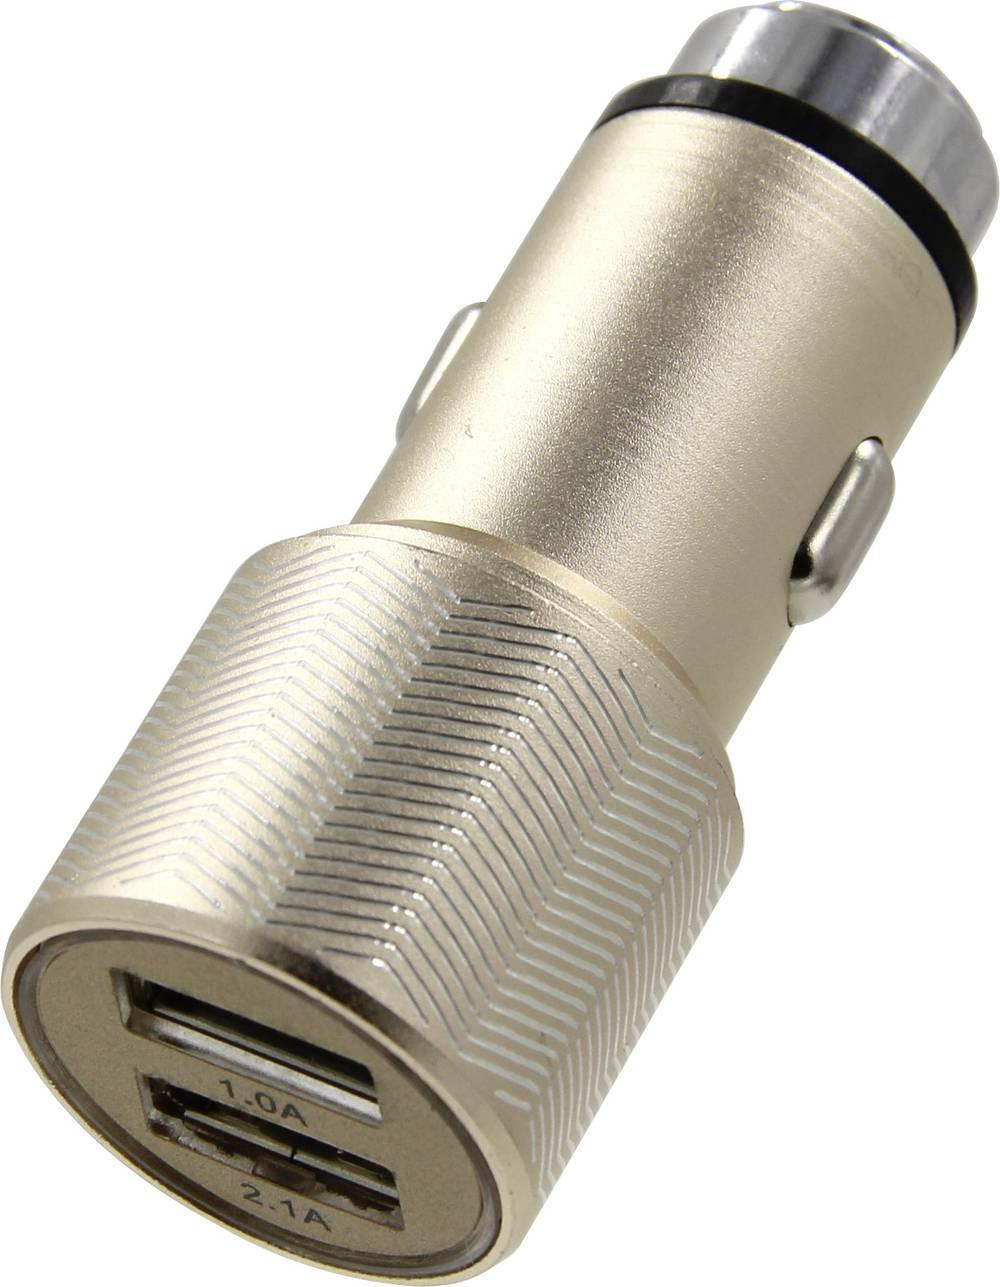 ACE Kfz-Ladegerät mit 2 USB-Anschlüssen und Nothammerfunktion Metallic-Gold 12 V til 5 V, 24 V til 5 V 3.1 A Cigarettænder-stik